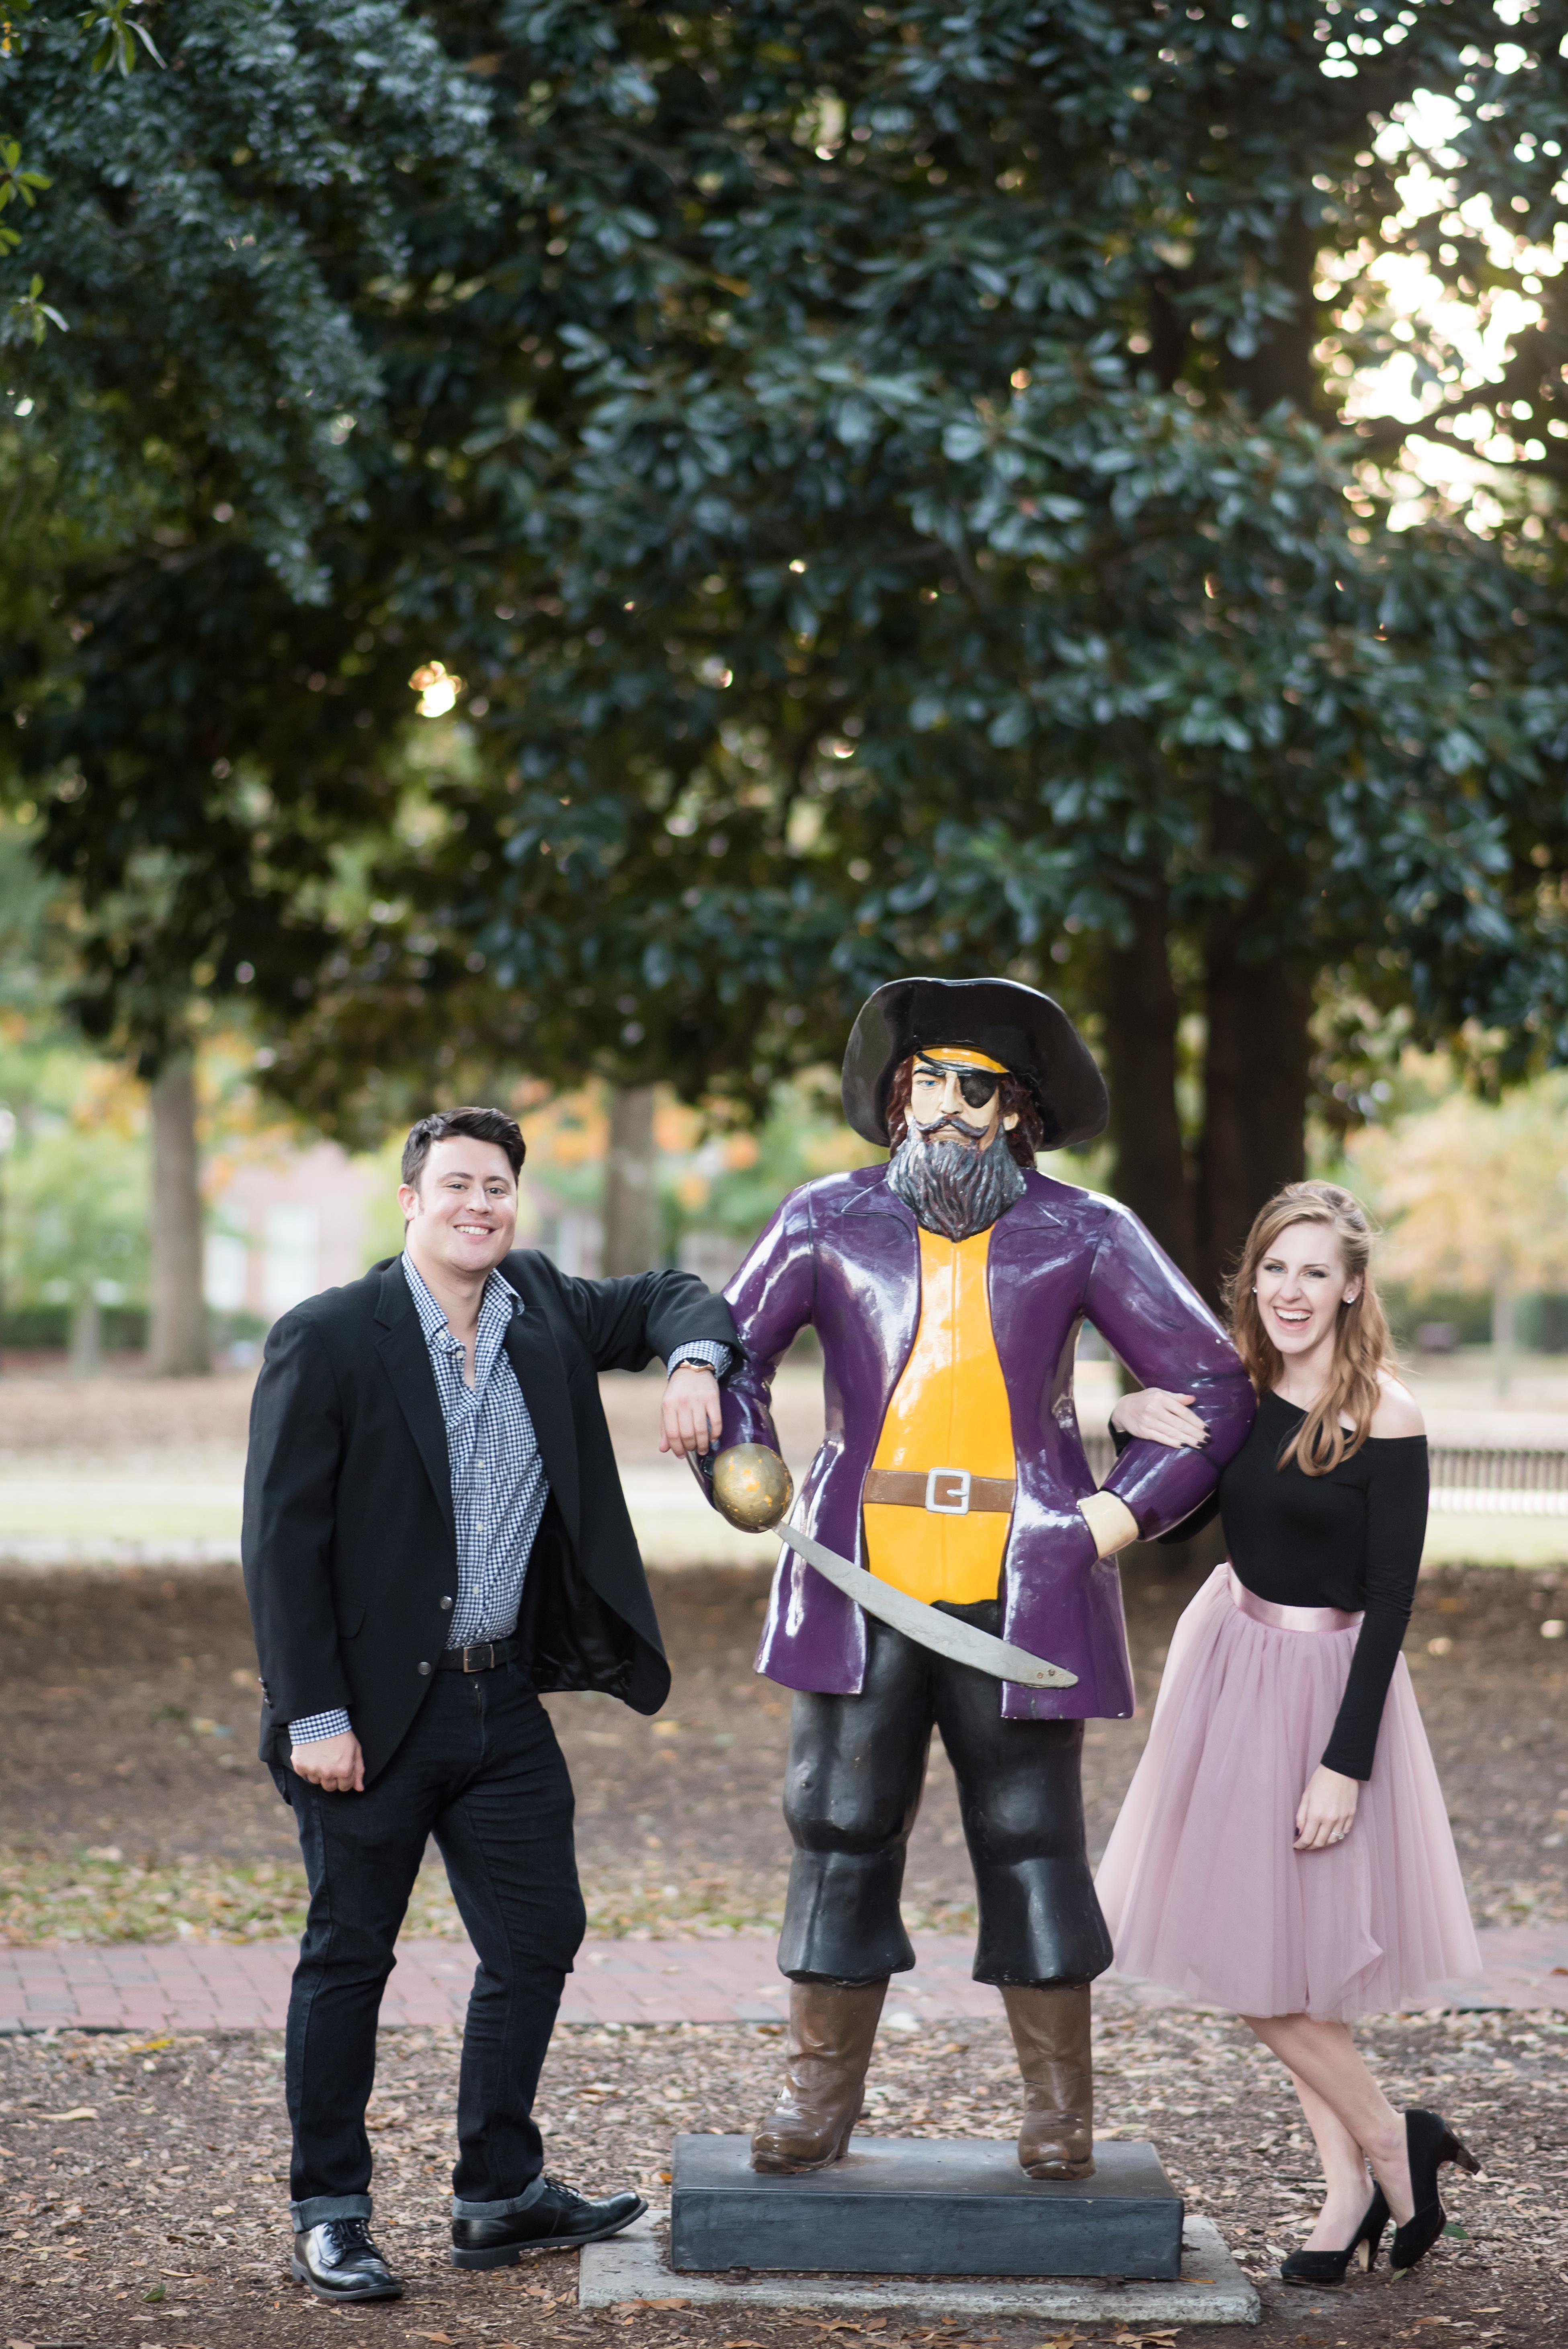 Arlie and Evan Kidd with PeeDee the Pirate